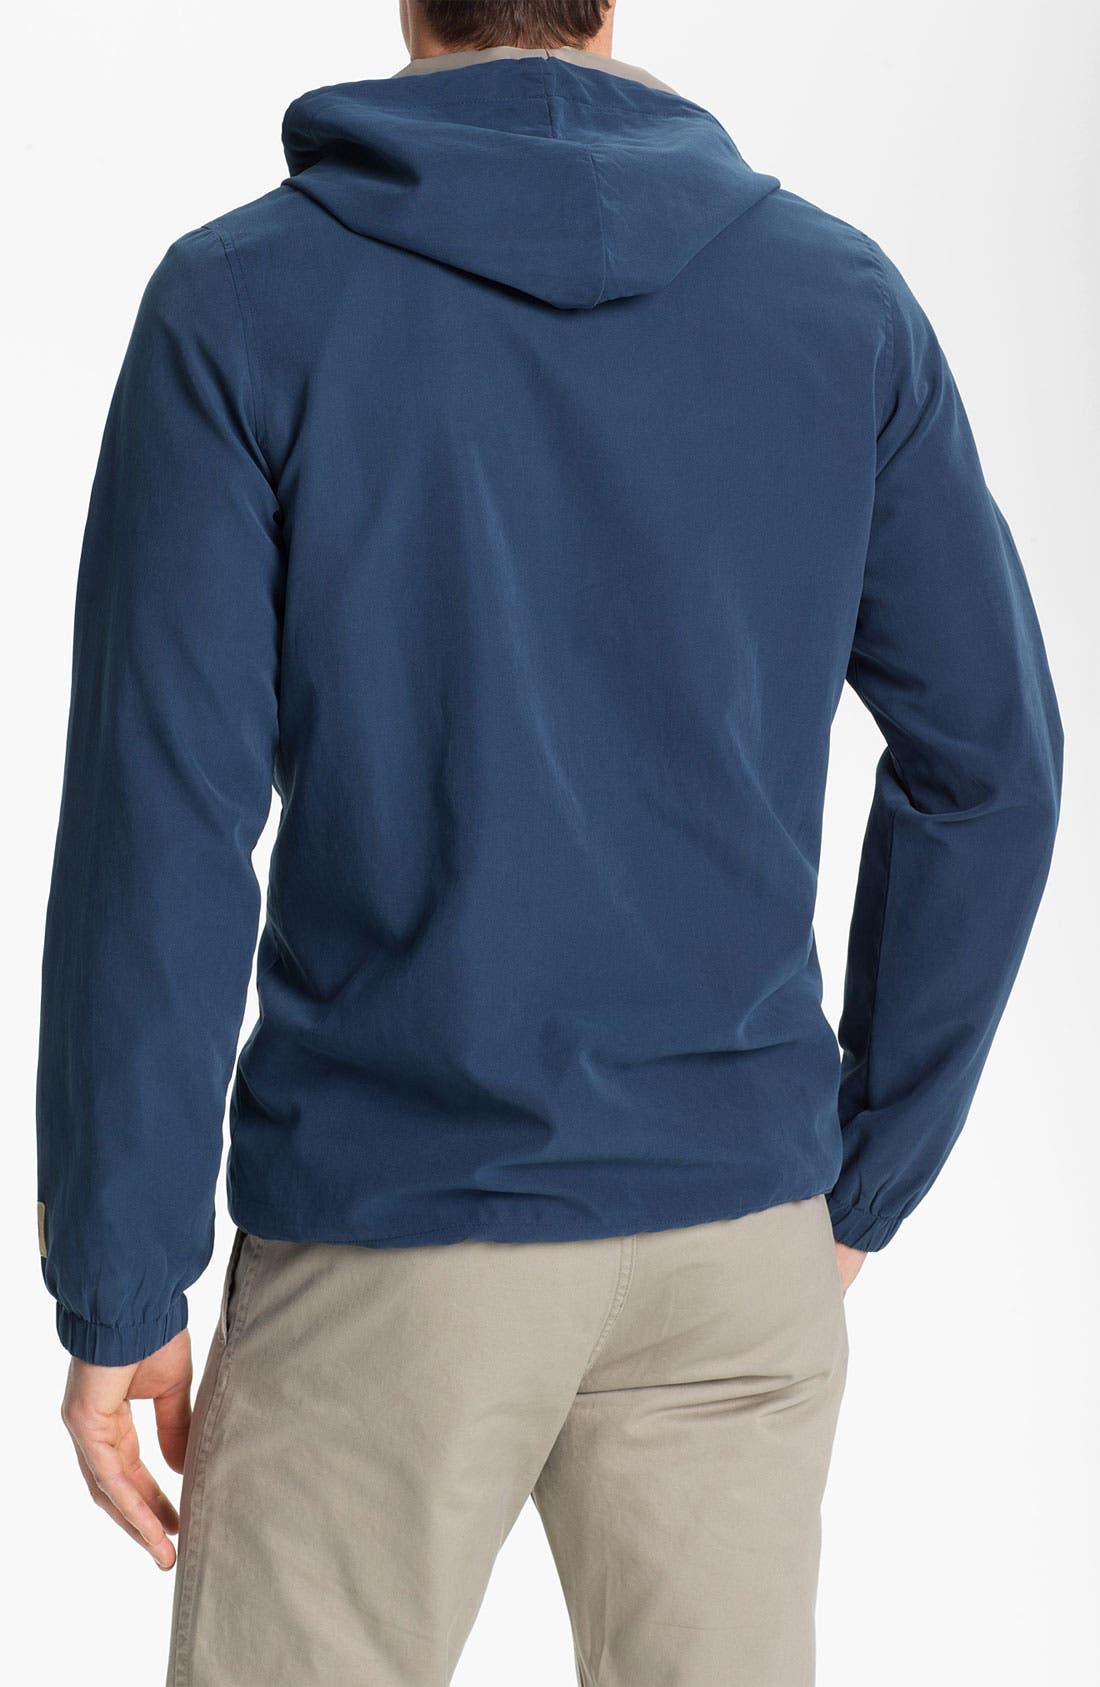 Alternate Image 2  - Obey 'Recluse' Zip Jacket